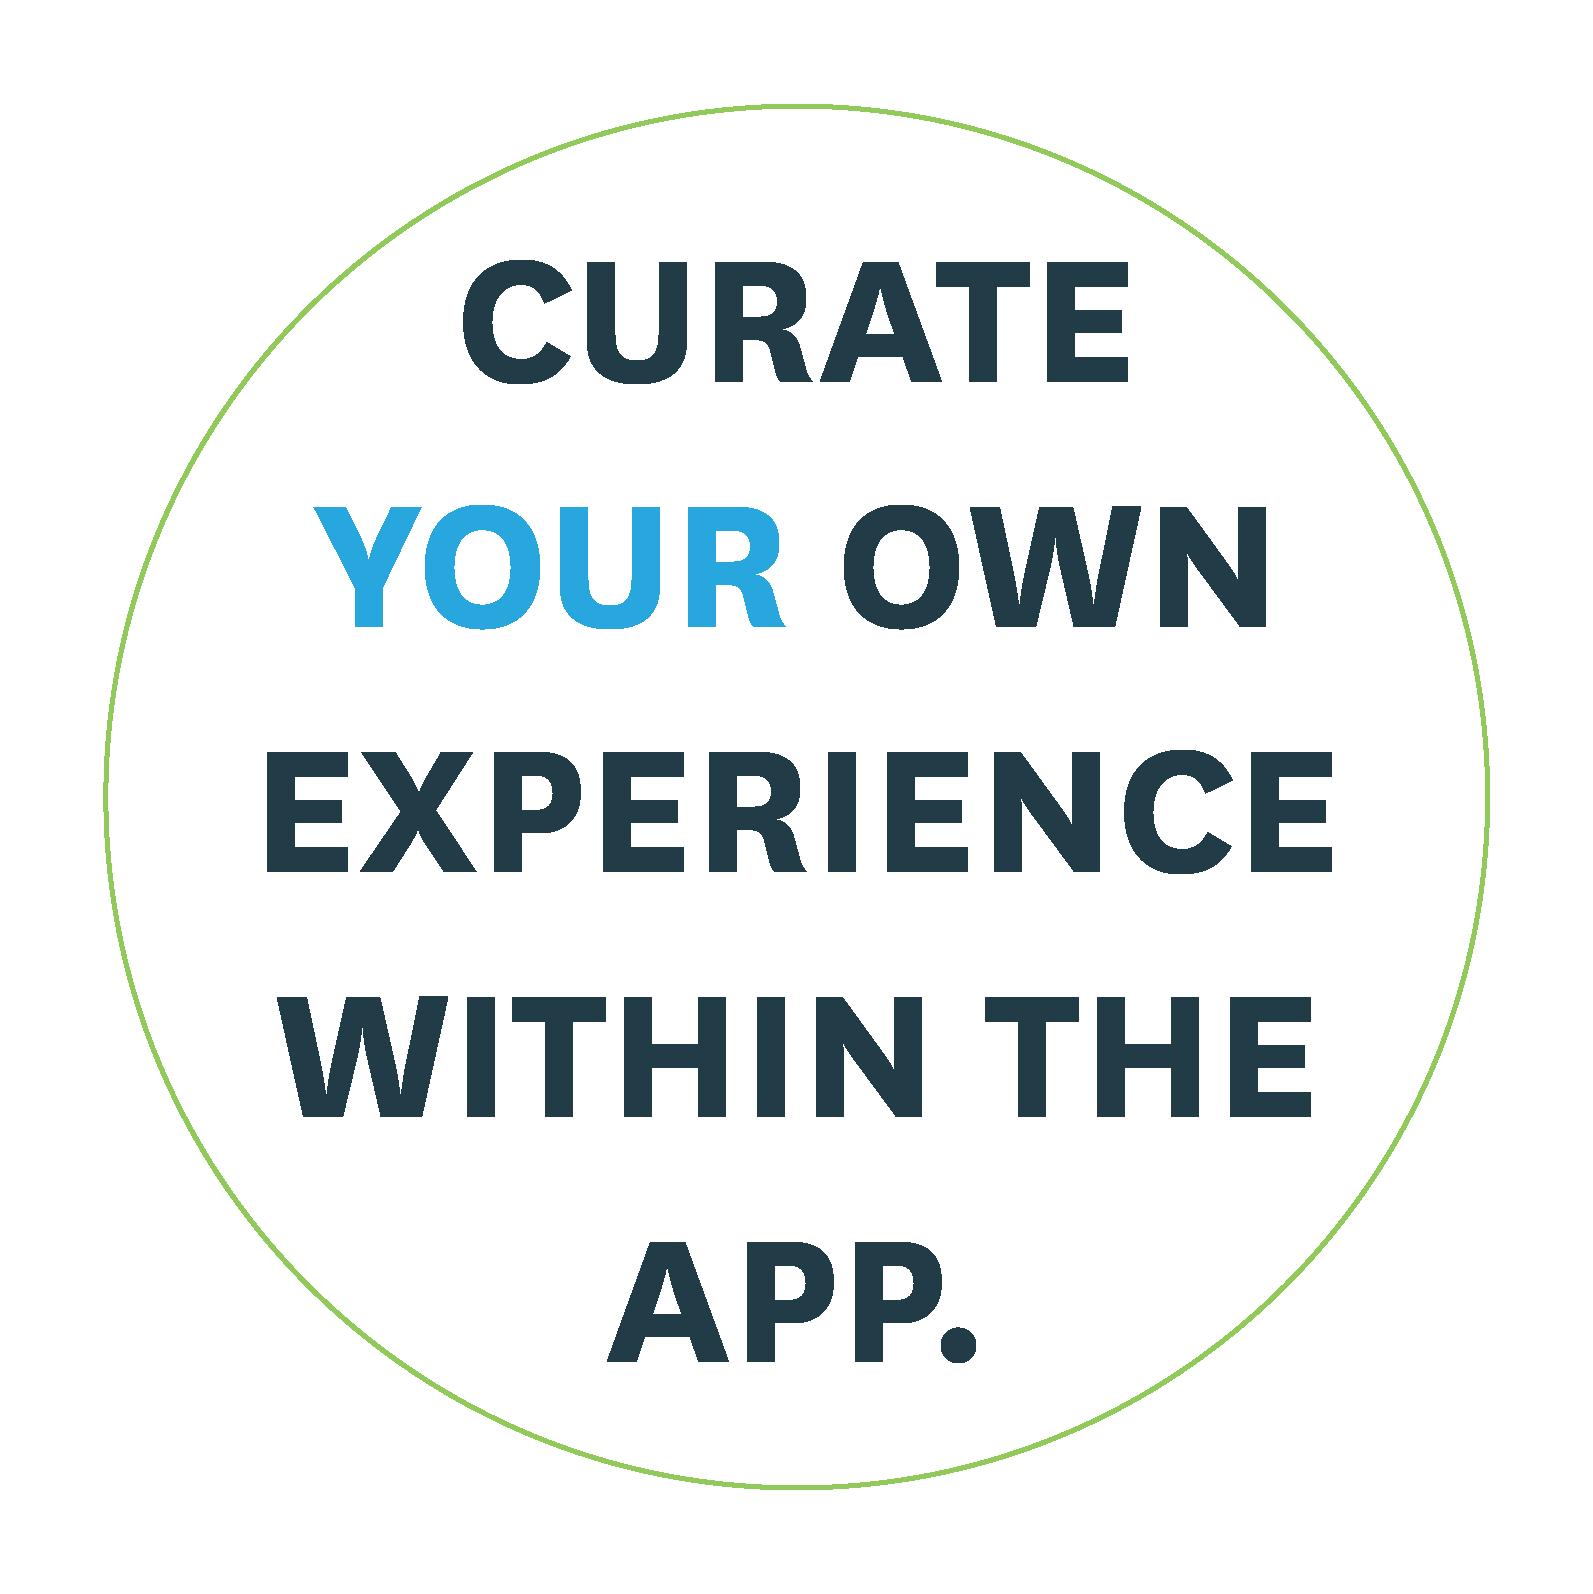 citymotion-transit-app-the-best-transit-information-app-personalized-app-employee-retainment-engagement-satisfaction